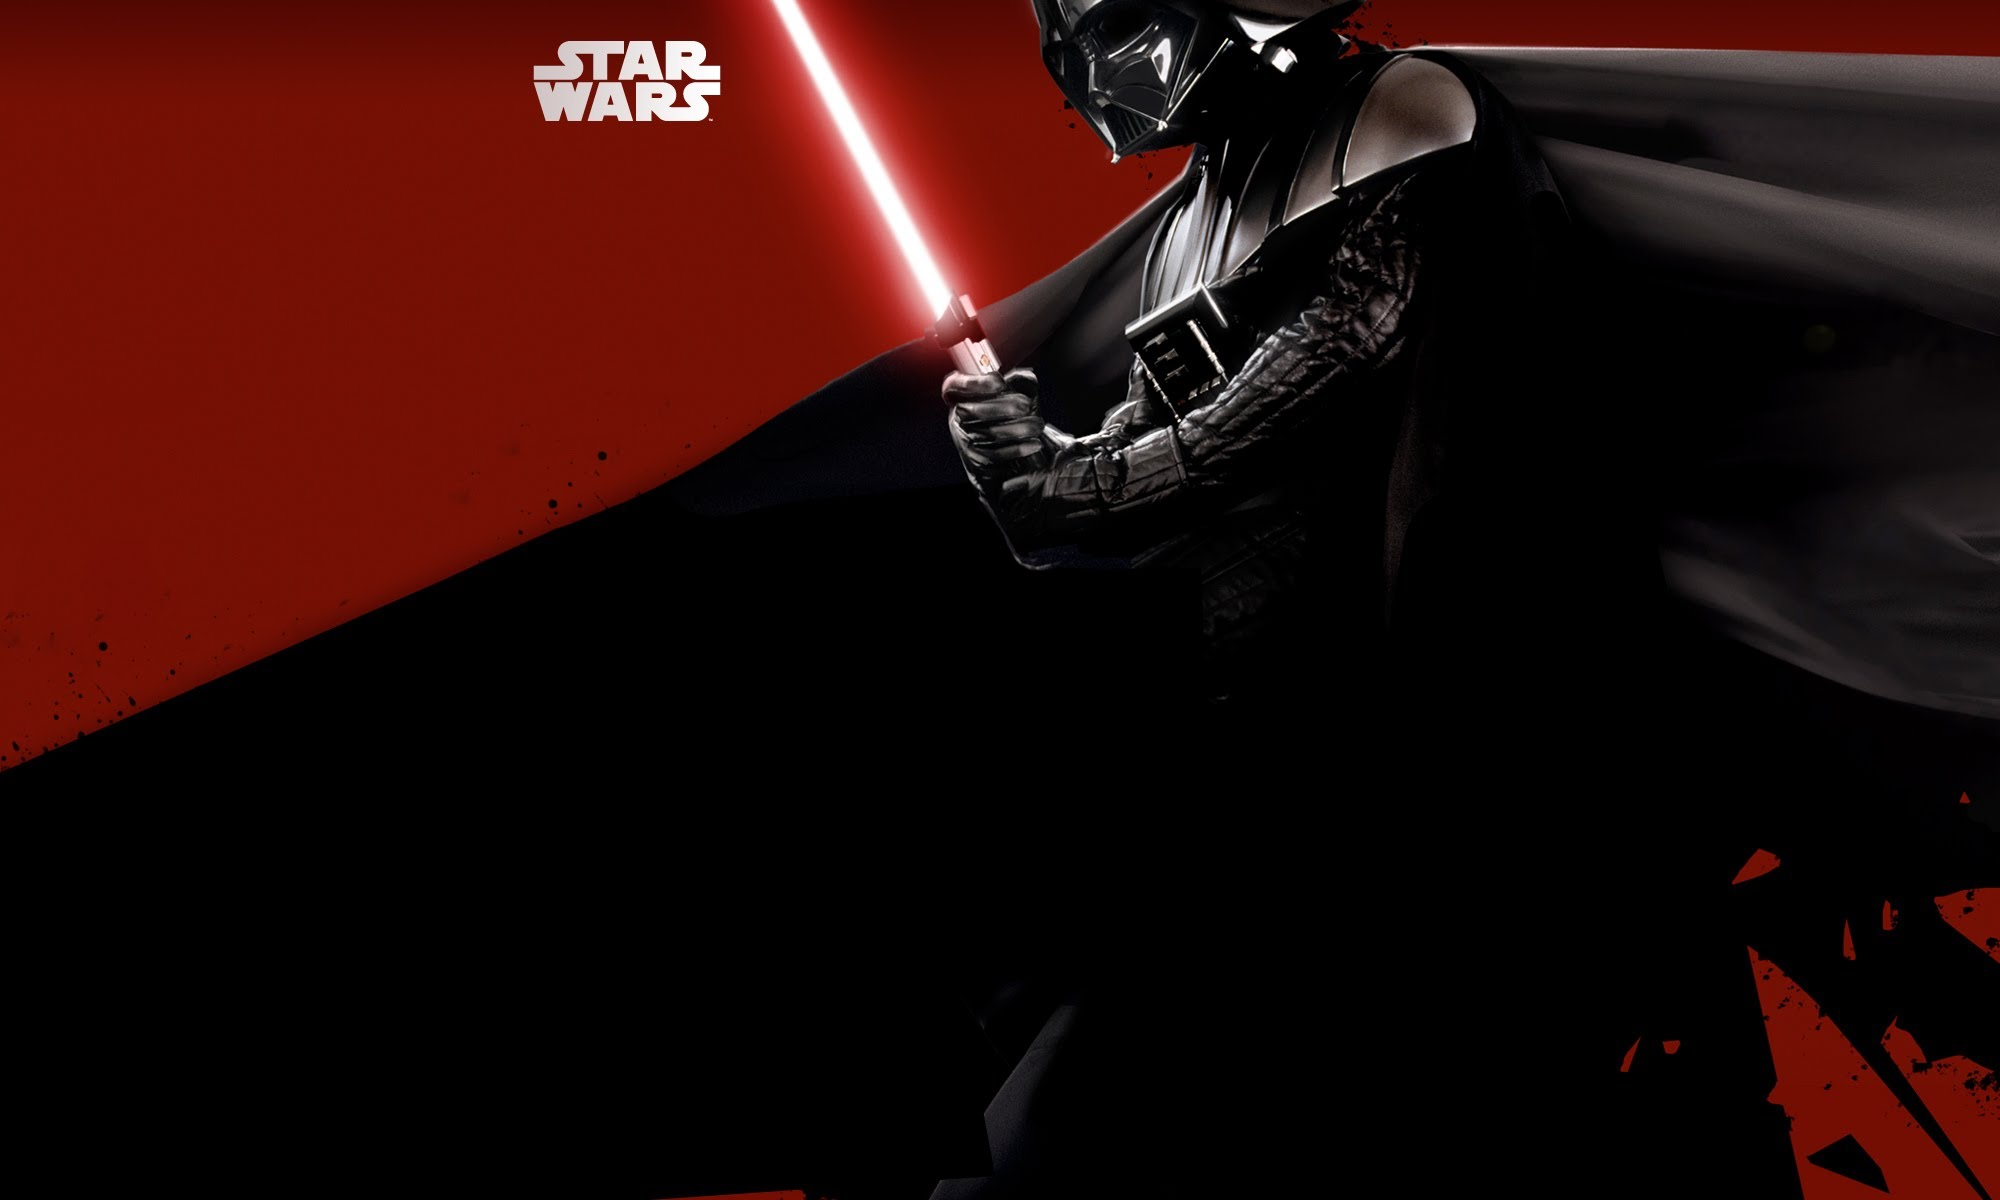 Darth Vader Christmas Wallpaper 2000 x 1200 108 kb jpeg darth vader 2000x1200